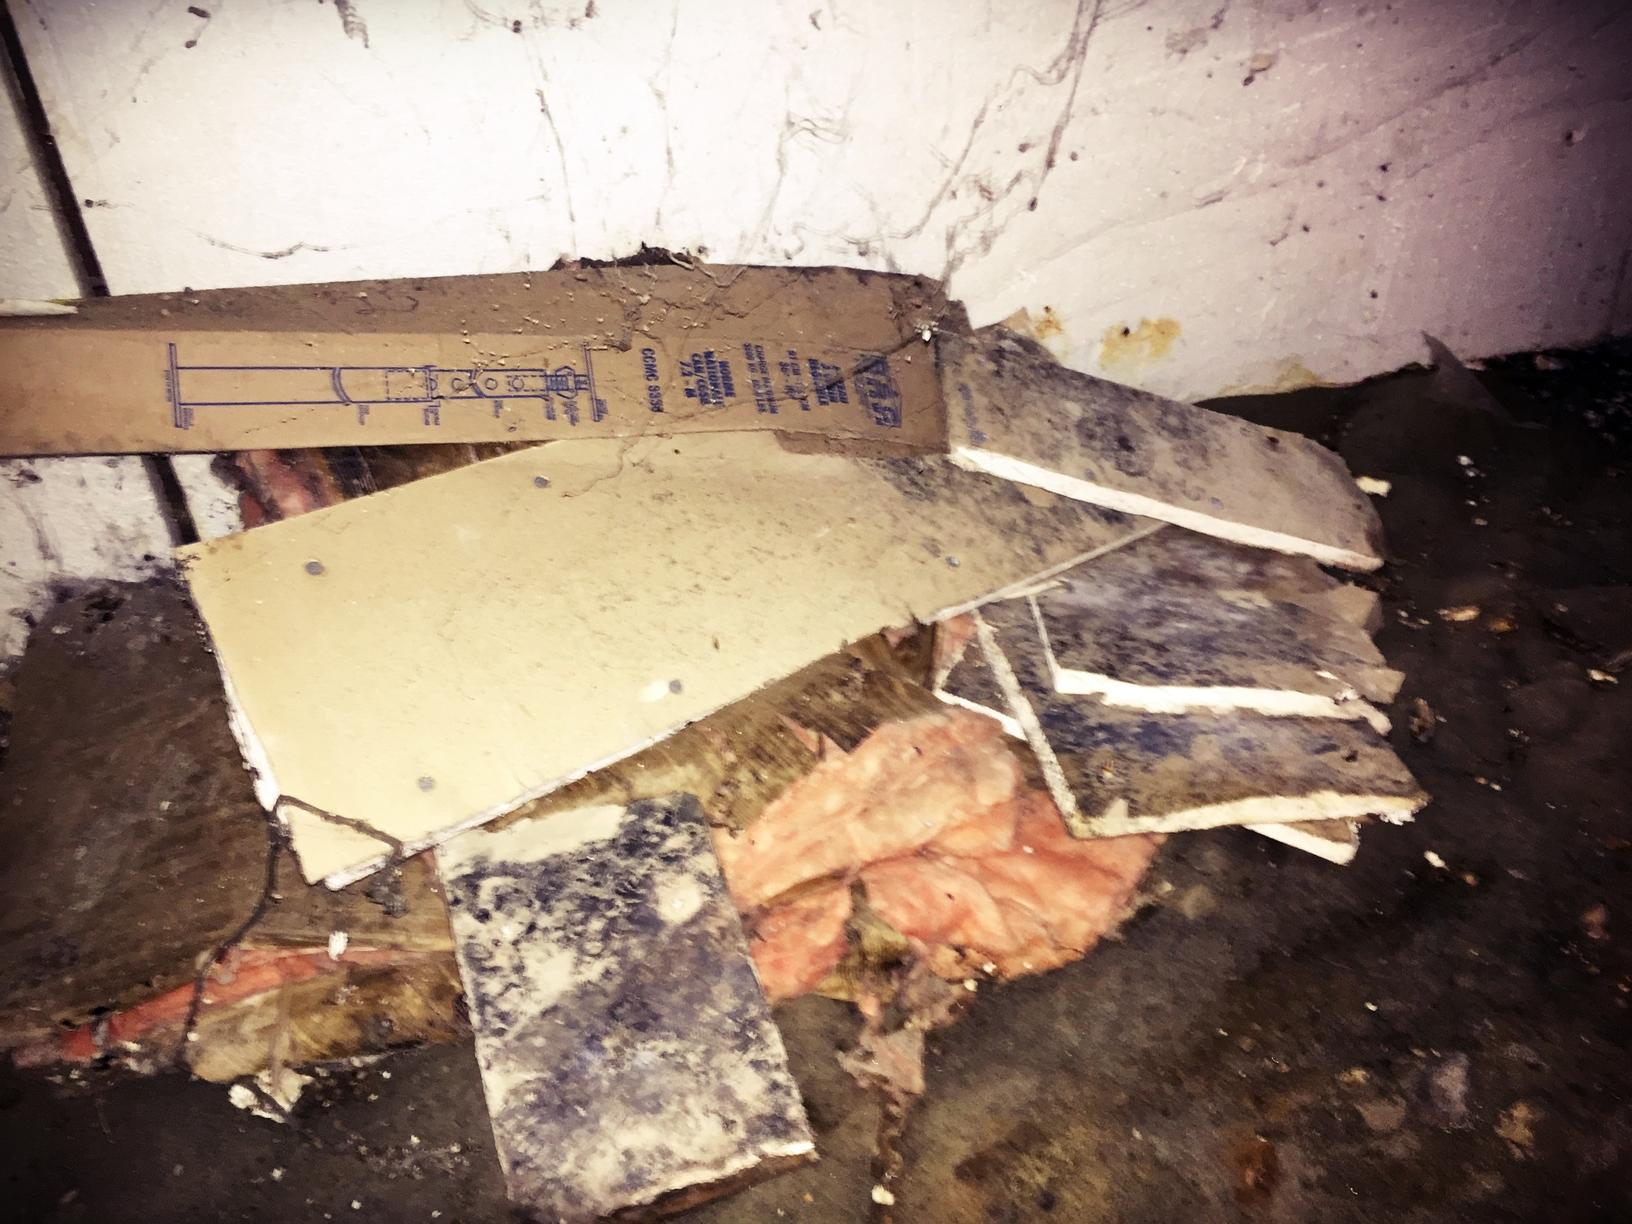 Debris left in a Nasty Crawl Space